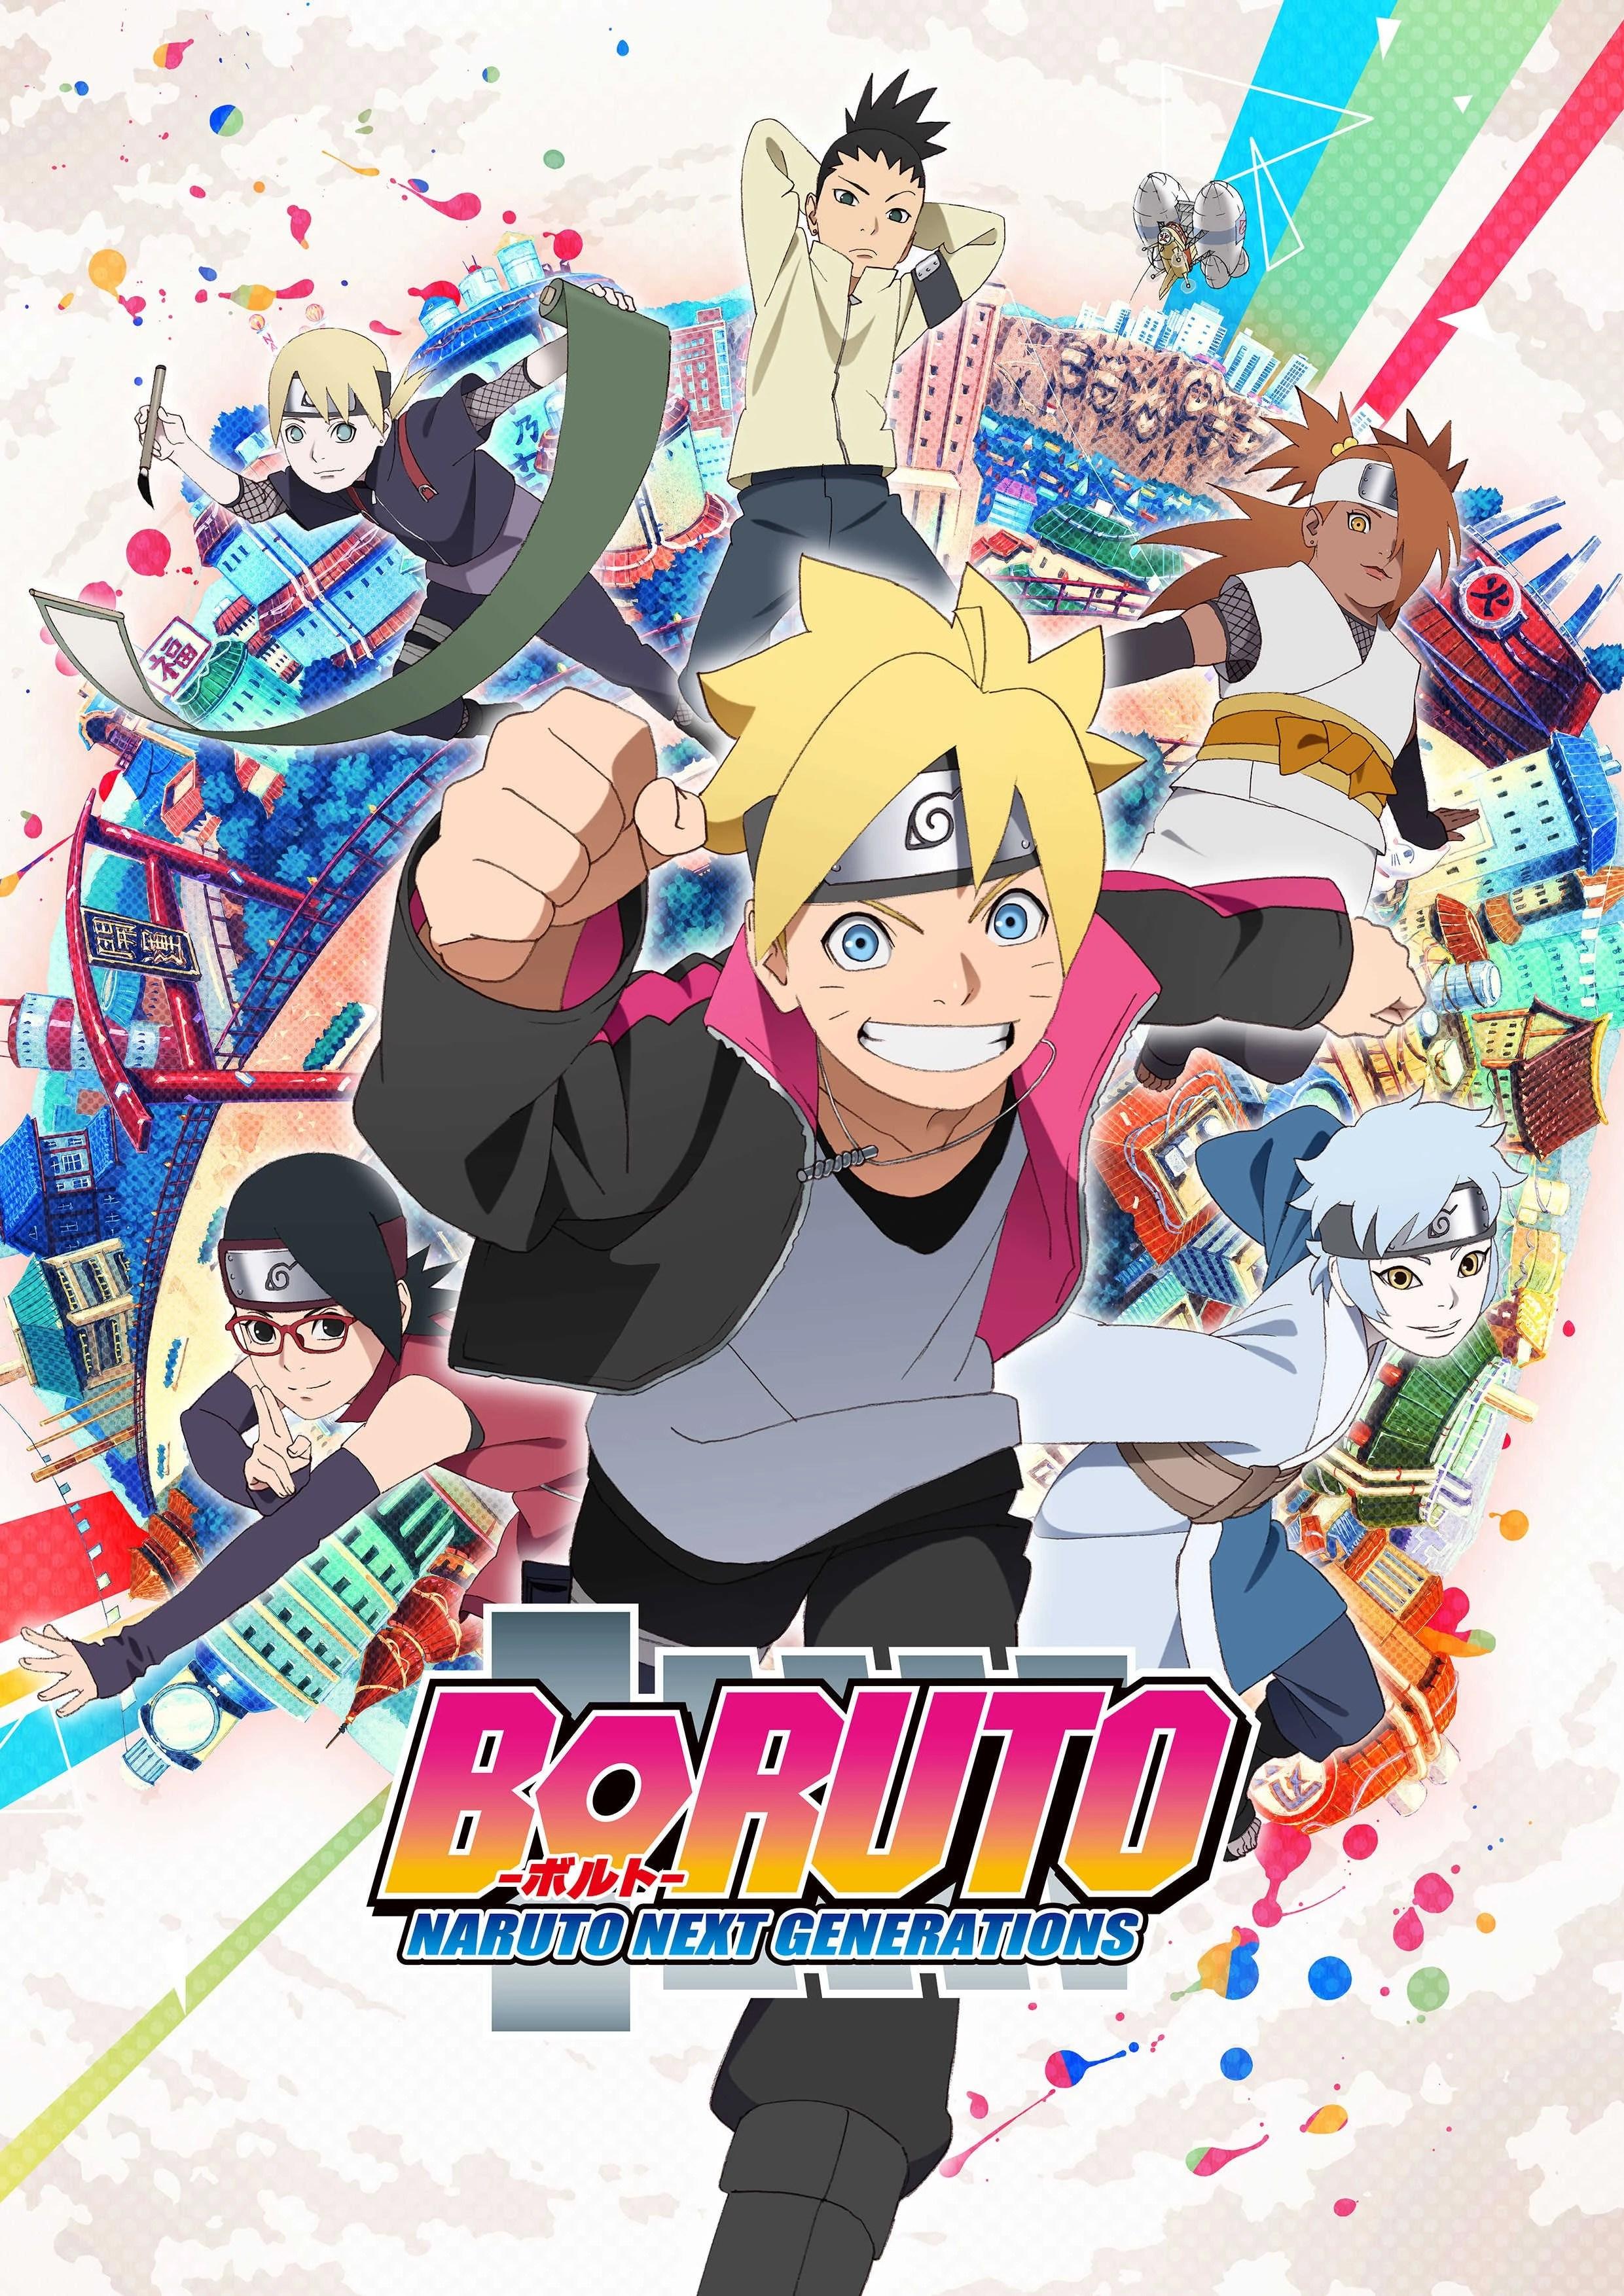 Manga Boruto Episode 39 : manga, boruto, episode, Boruto:, Naruto, Generations, Anime, Voice-Over, Fandom